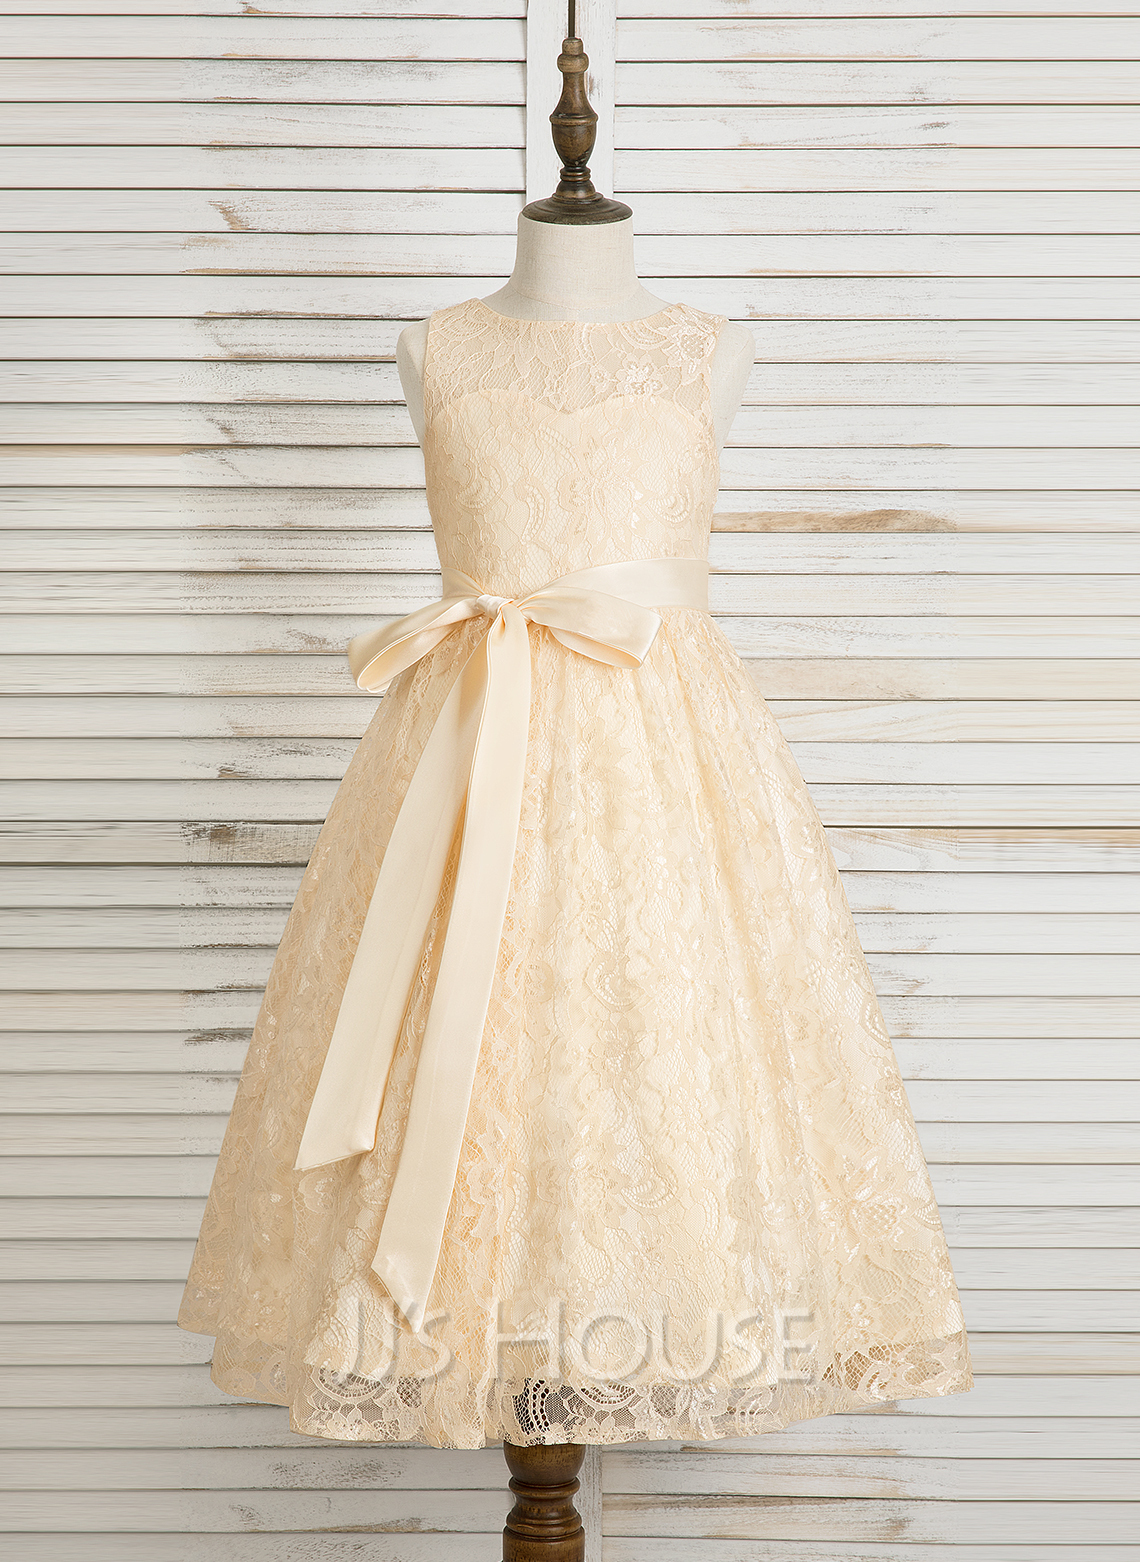 A-Line/Princess Tea-length Flower Girl Dress - Lace Sleeveless Scoop Neck With Bow(s)/Back Hole